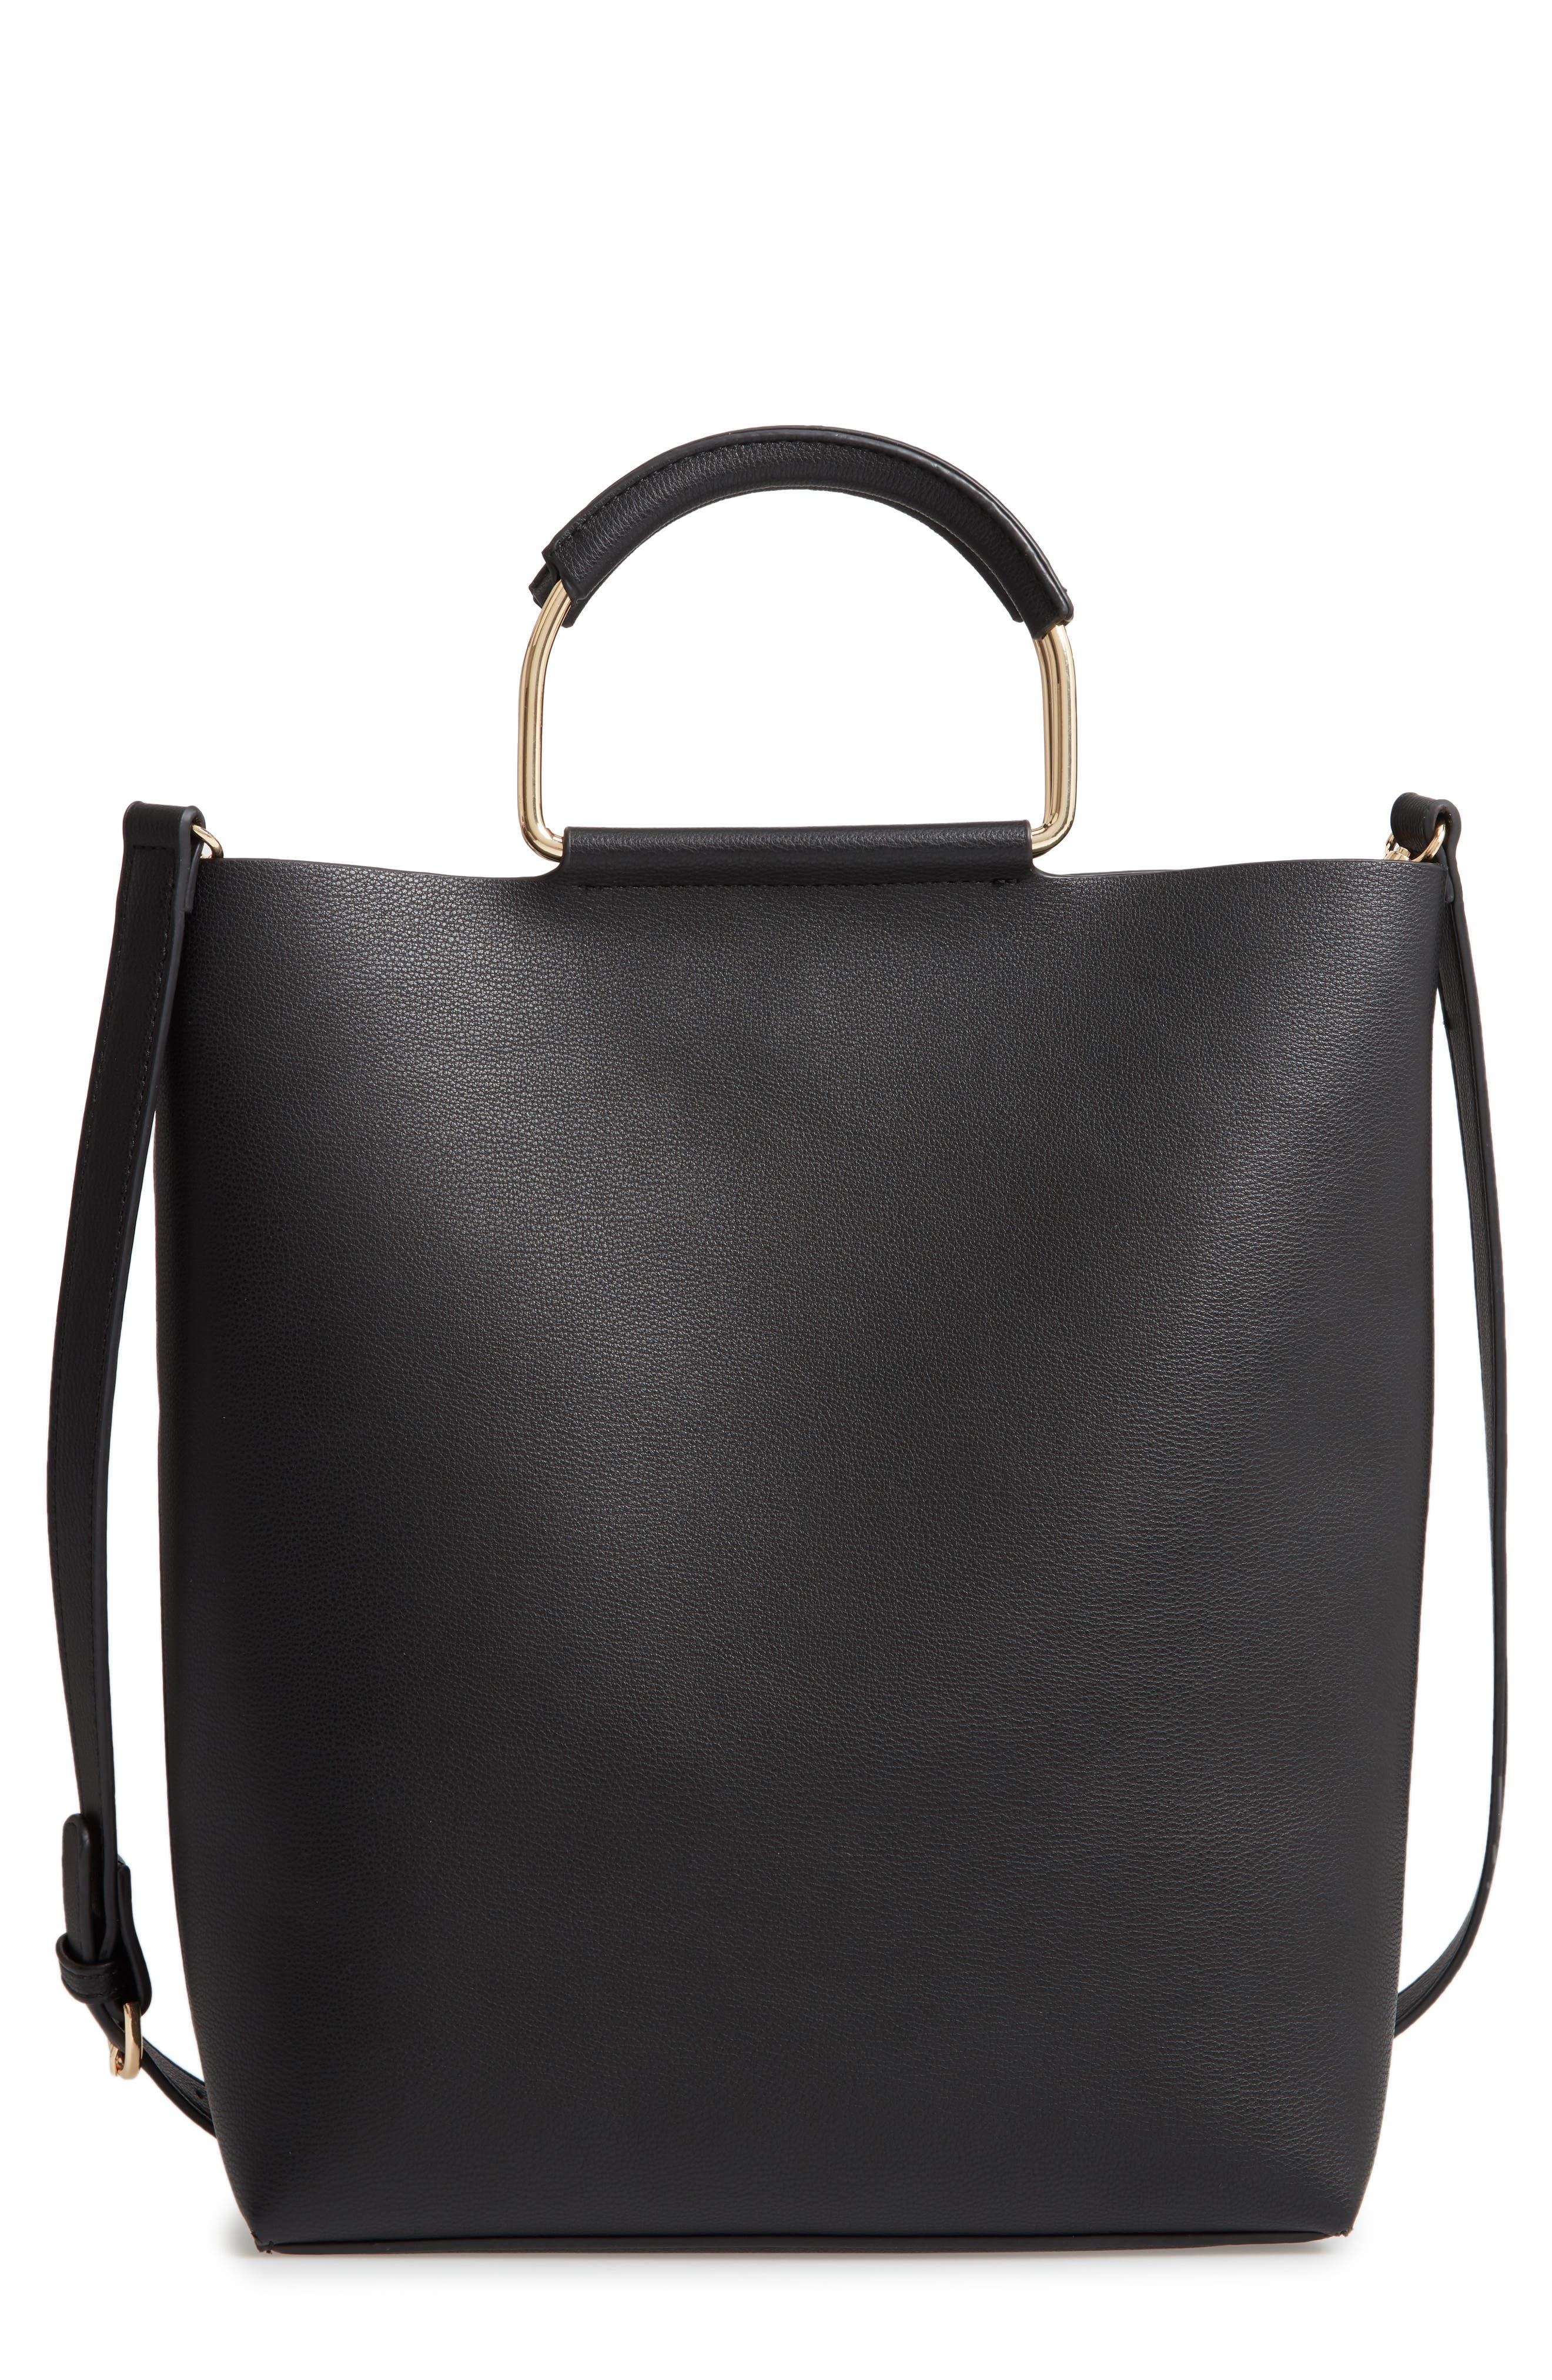 Payton Convertible Faux Leather Tote,                             Main thumbnail 1, color,                             BLACK